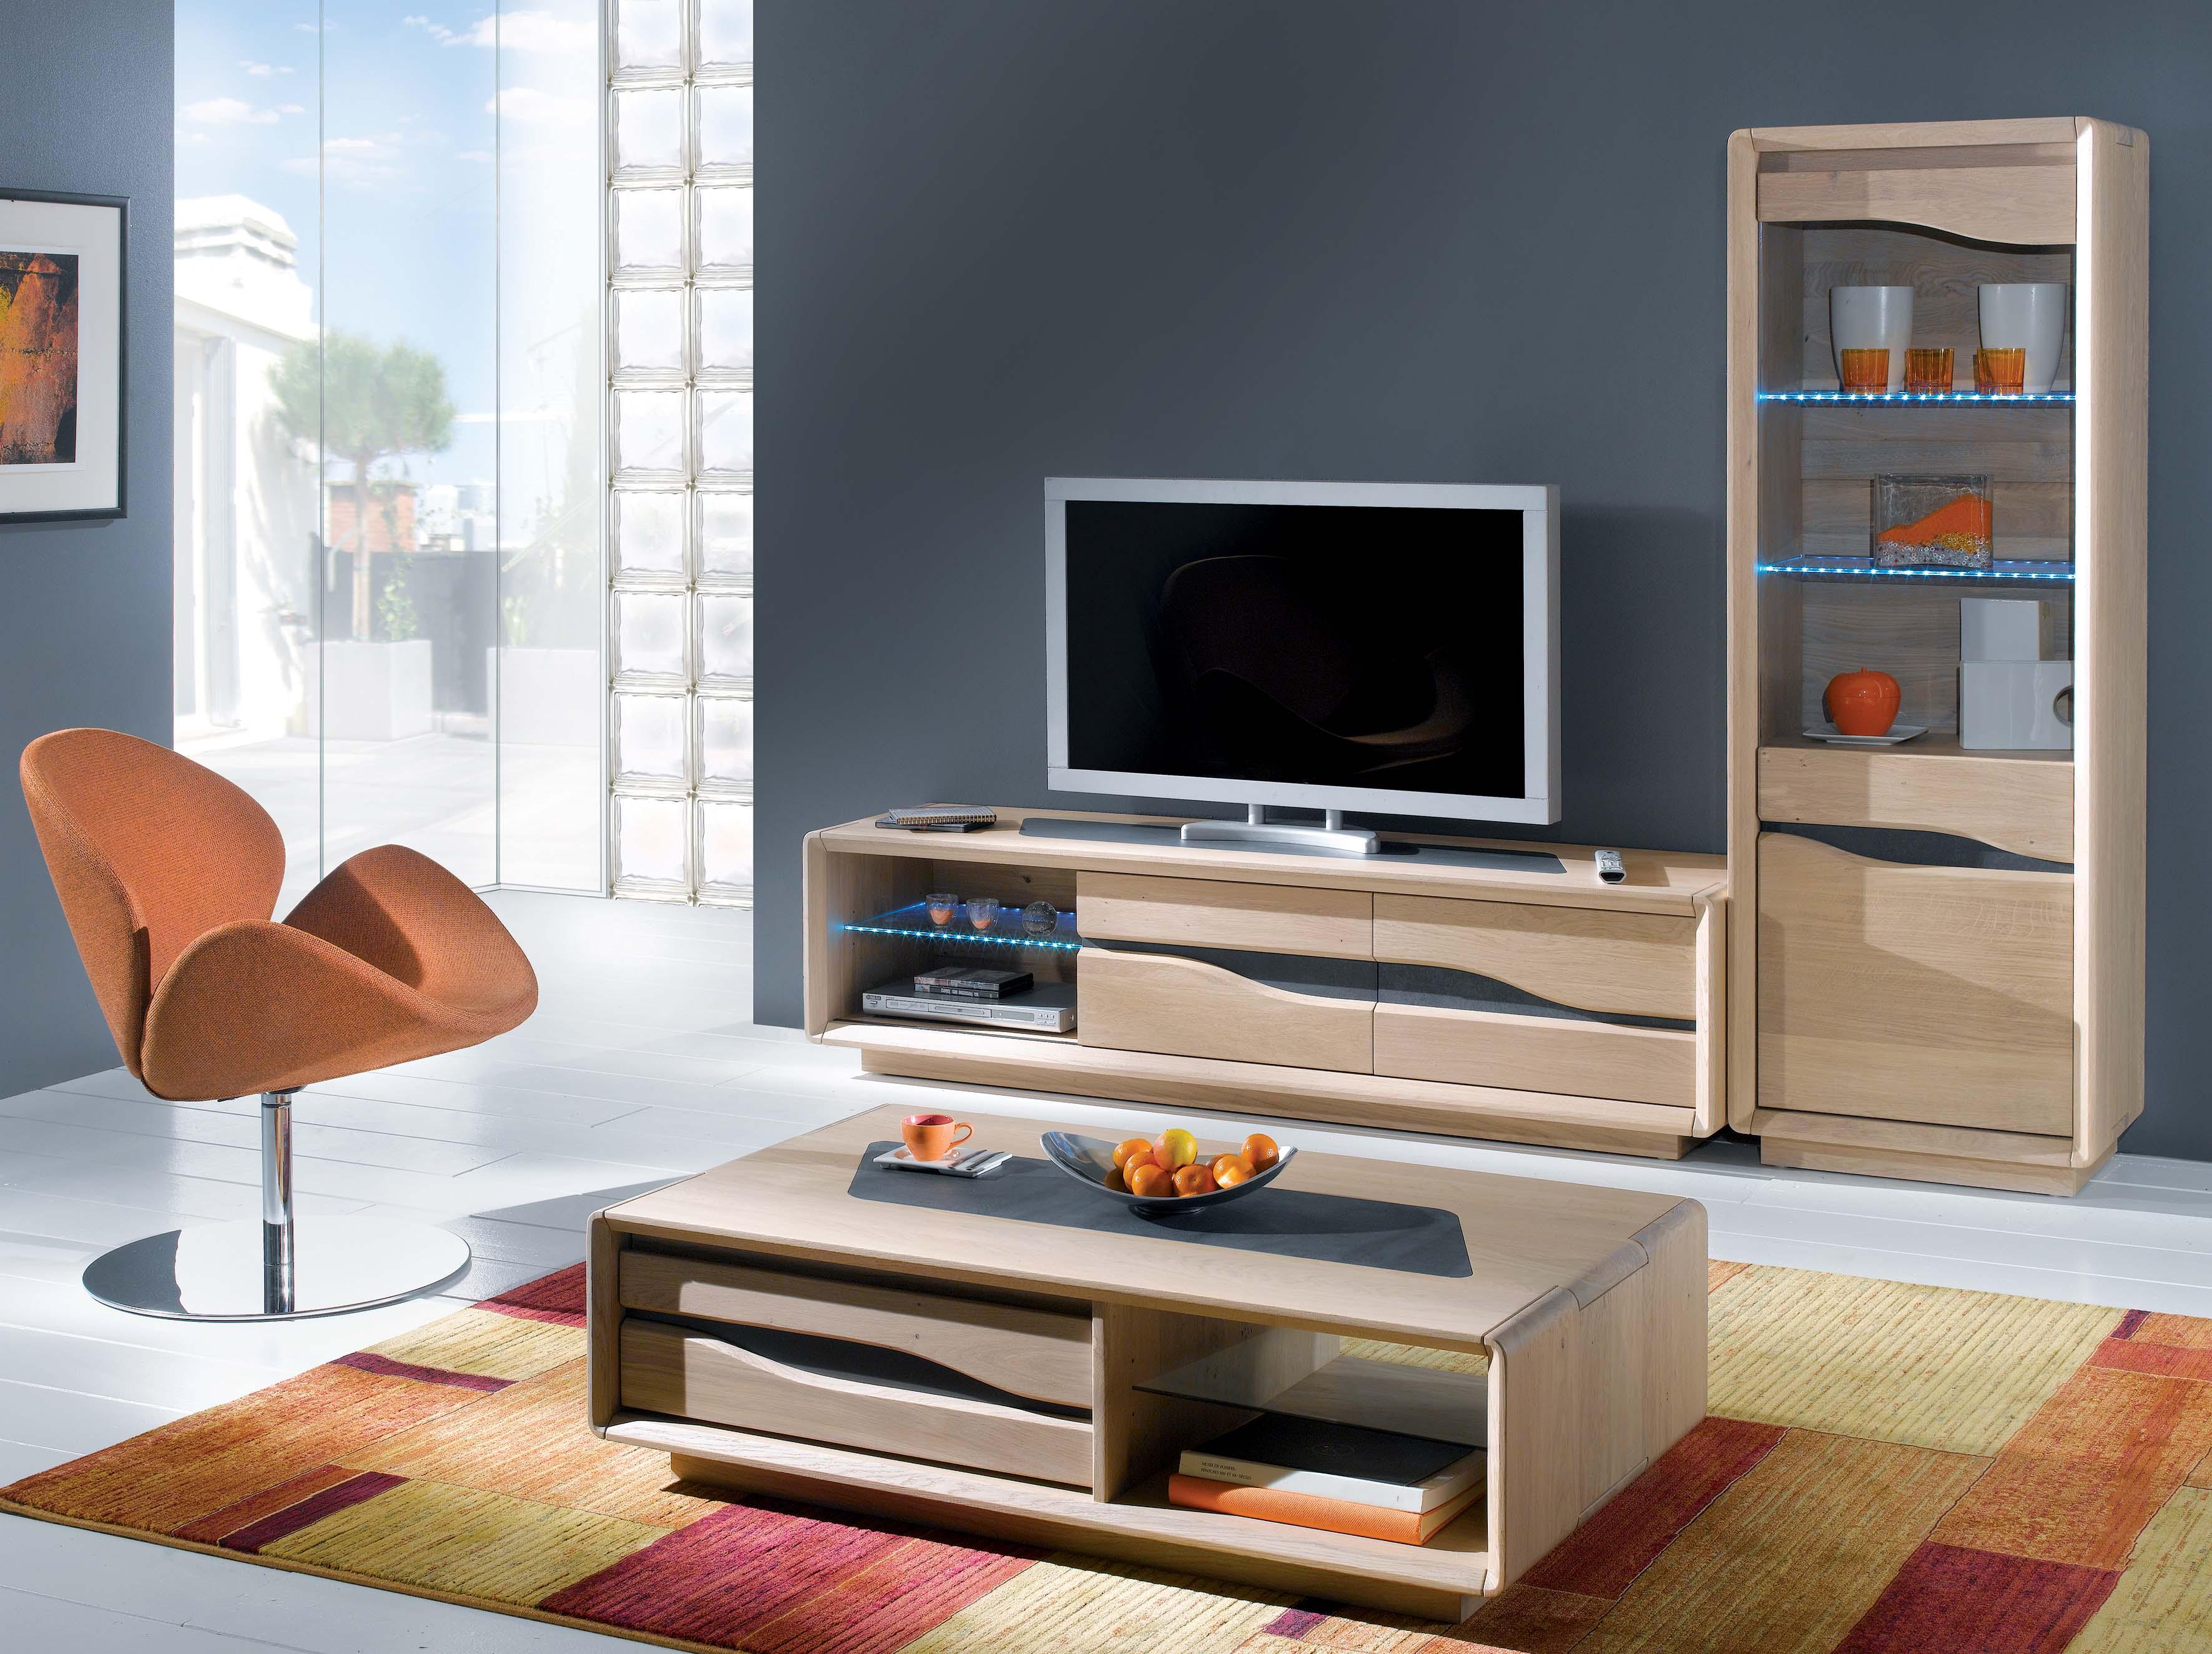 Meuble Tv Living Salon meuble tv céram 2 portes de 1.80m